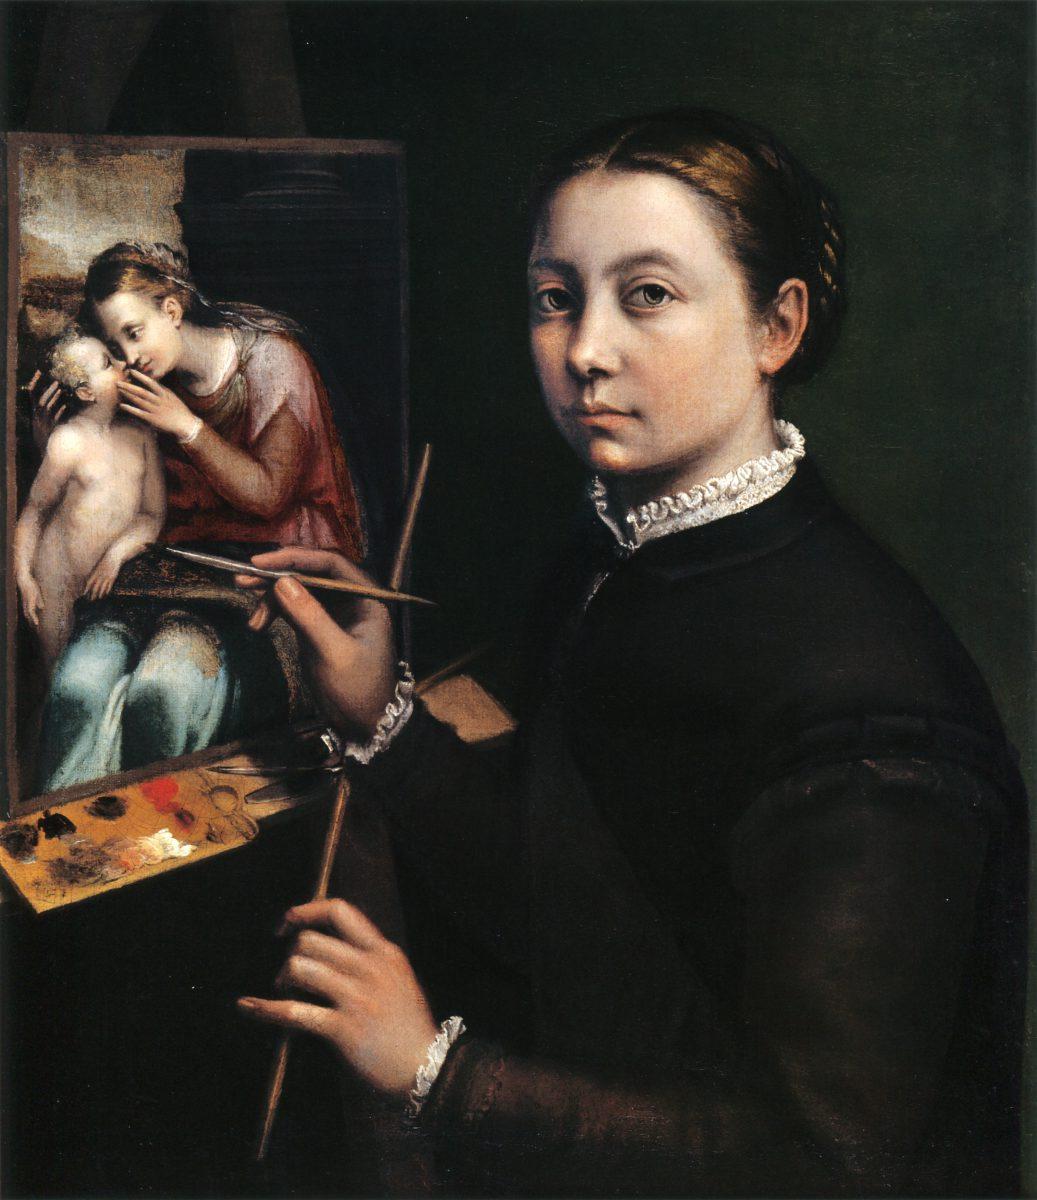 Sofonisba Anguissola - 1556